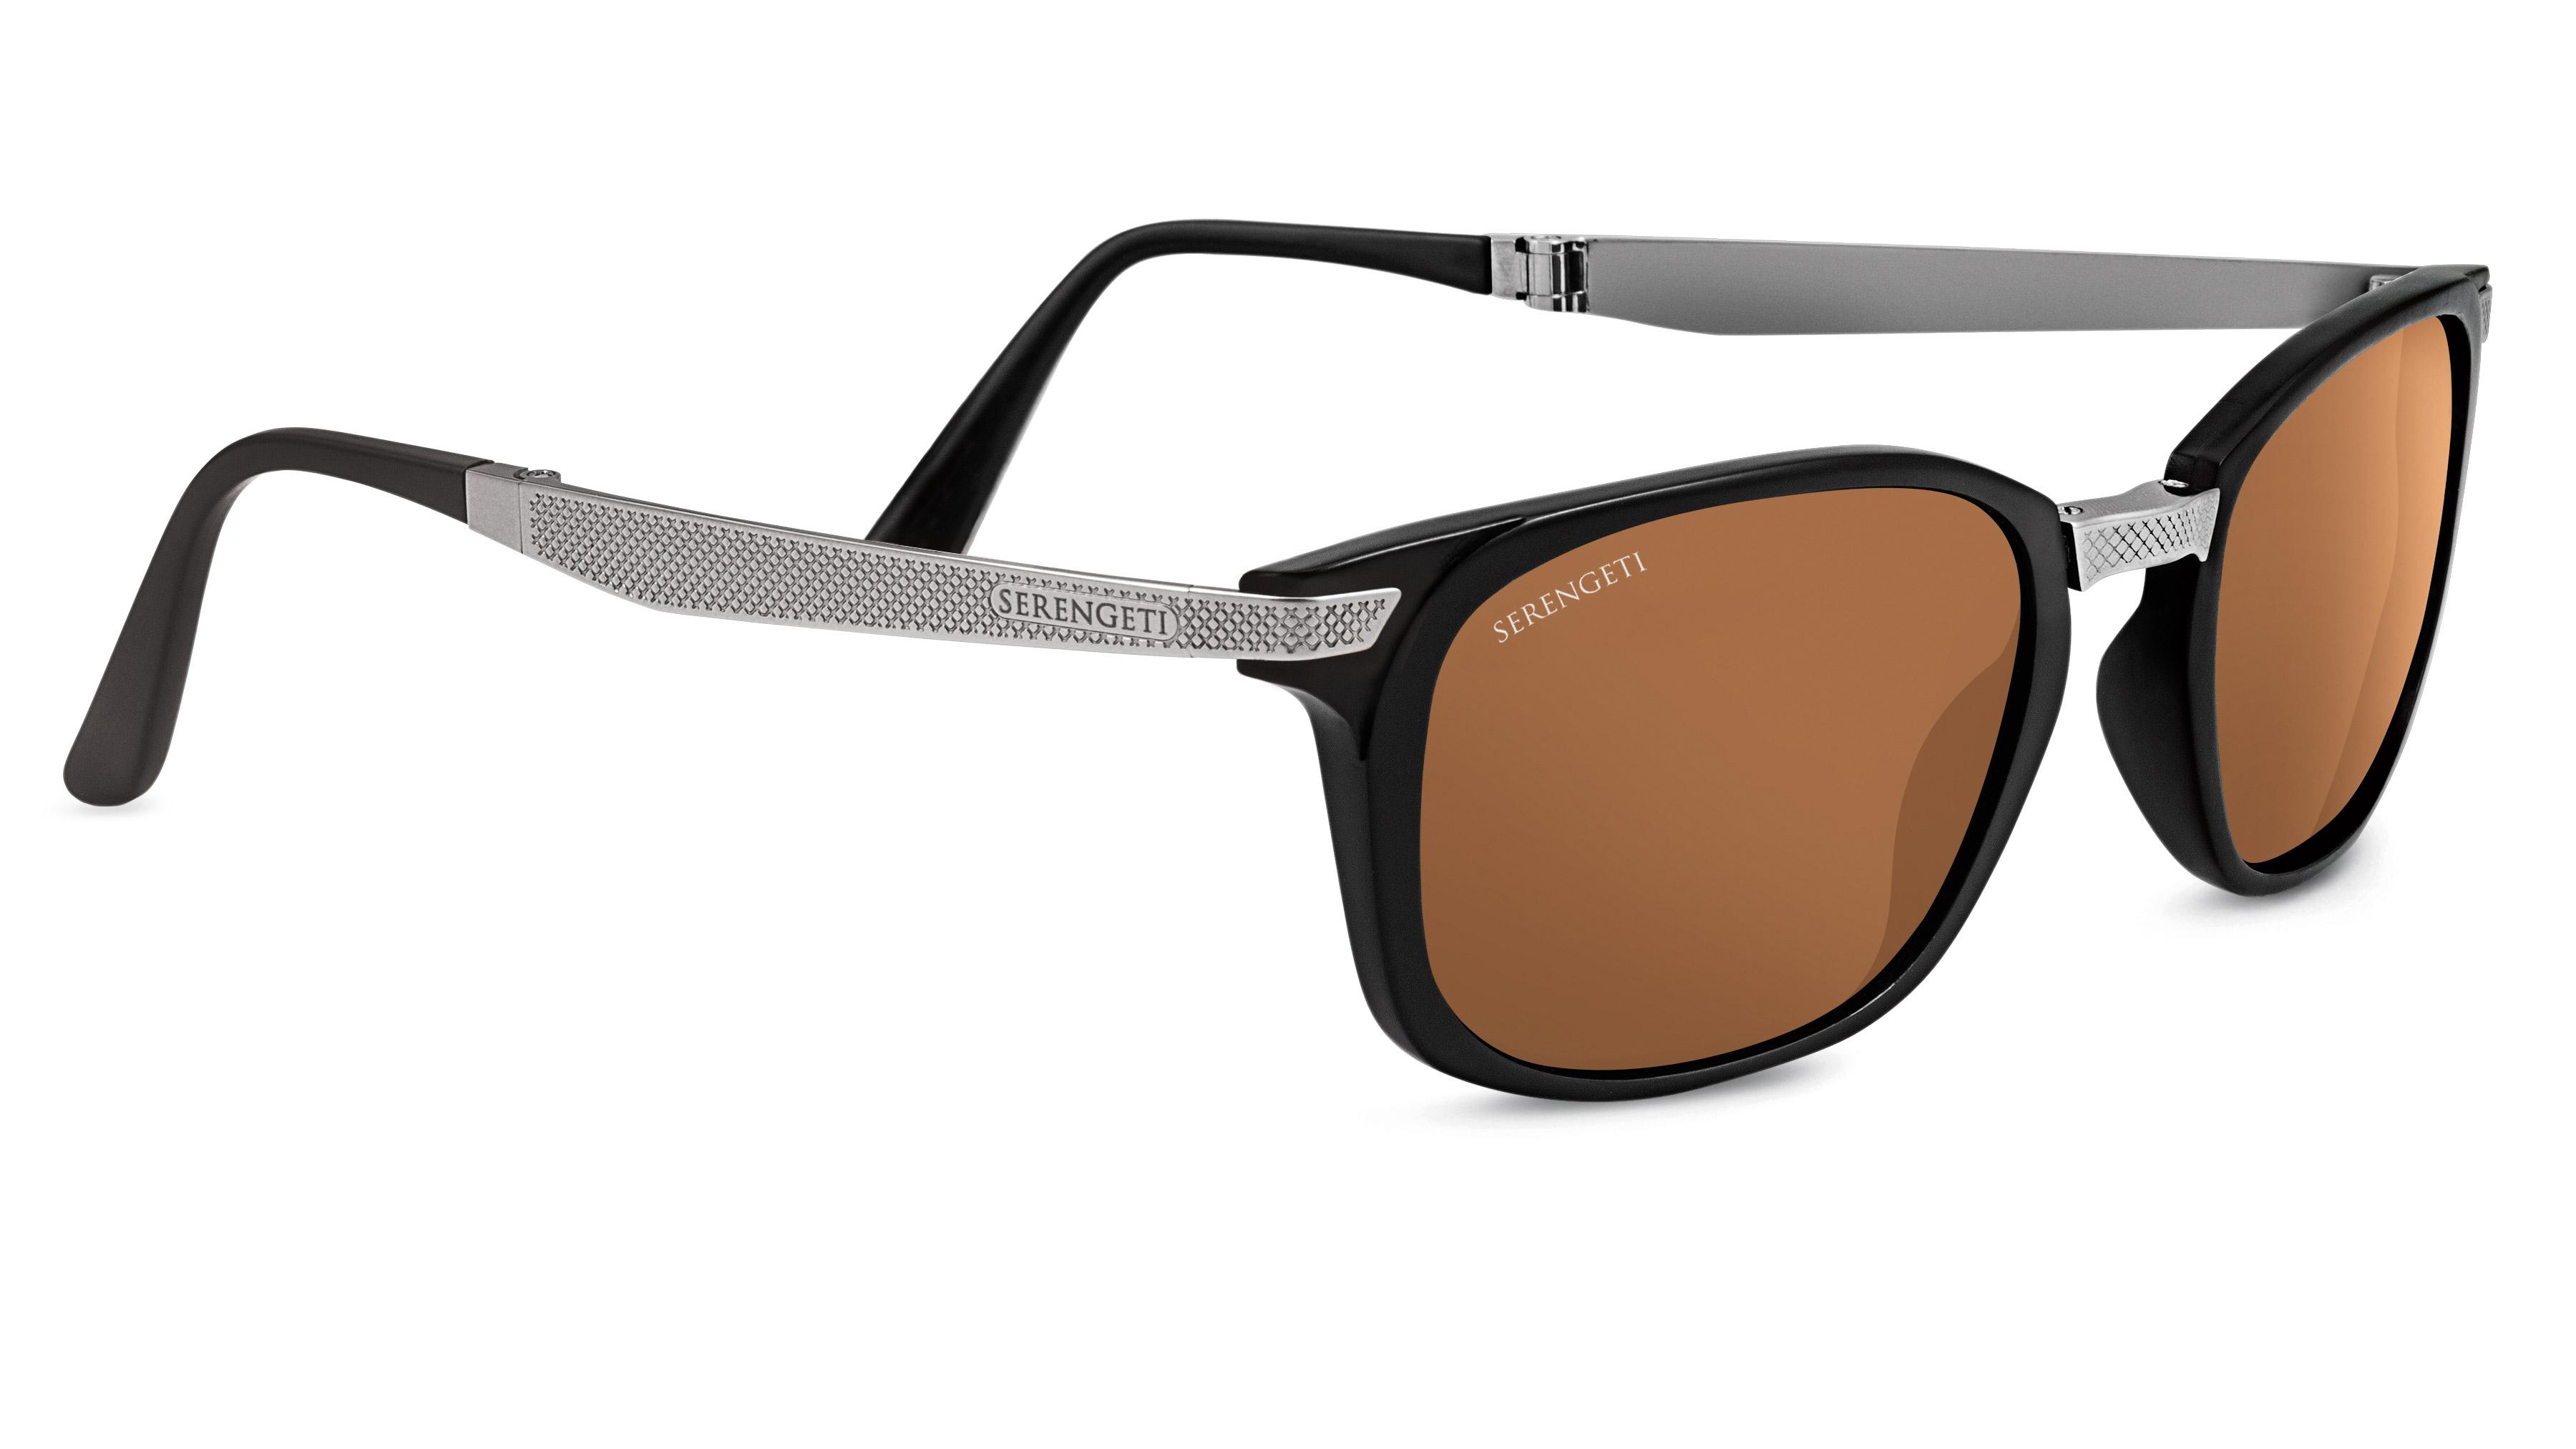 62509f1af521d Serengeti Volare Sunglasses